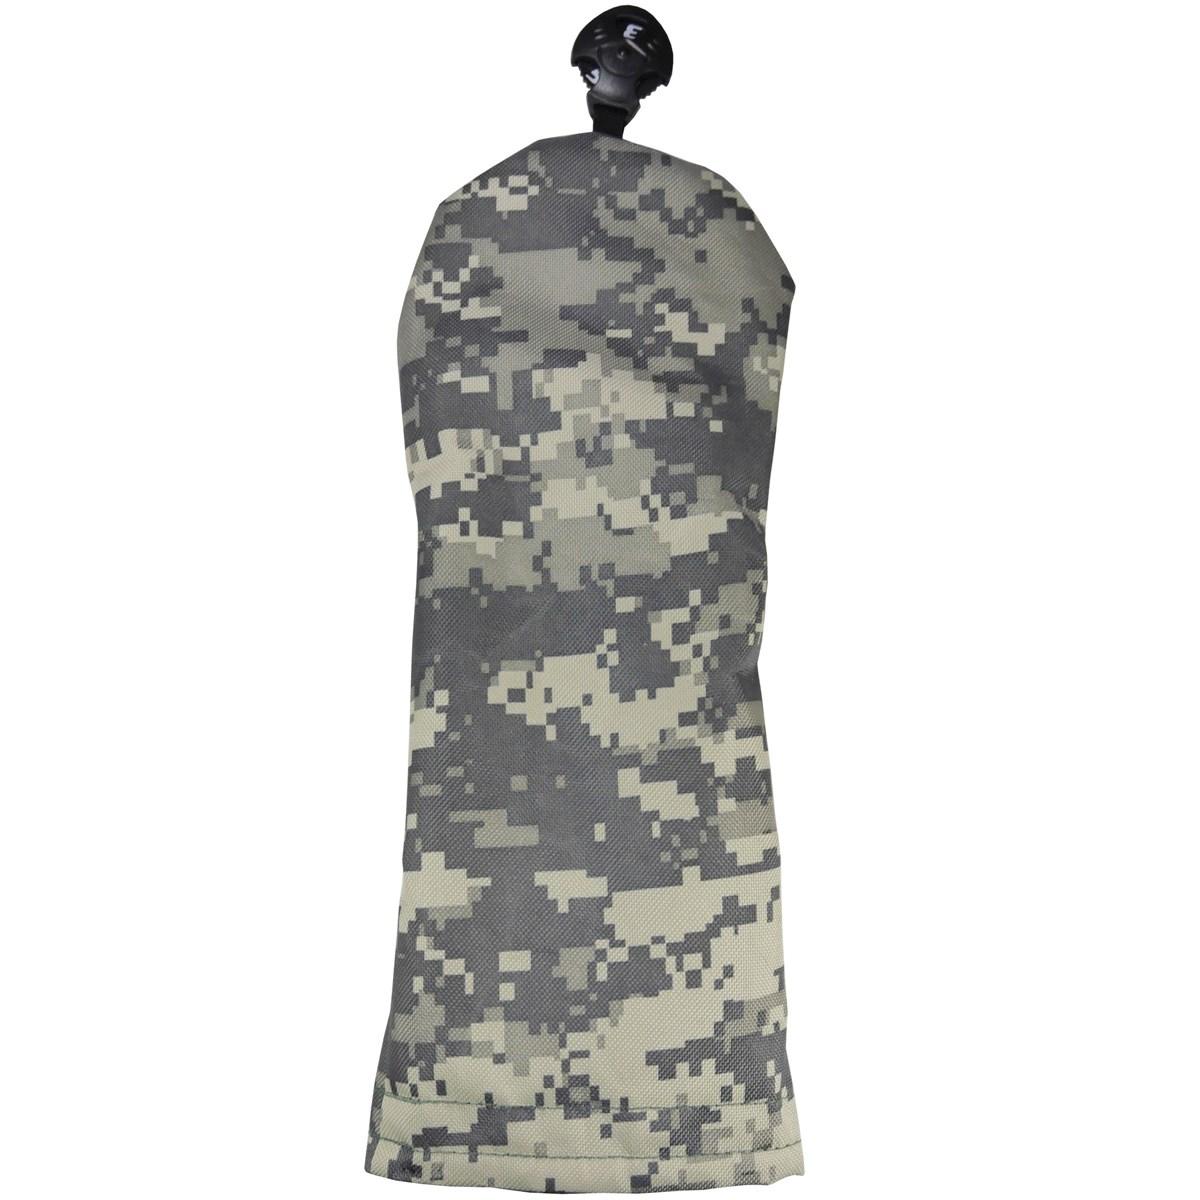 AZROF ヘッドカバー FW用 デジカモグレー